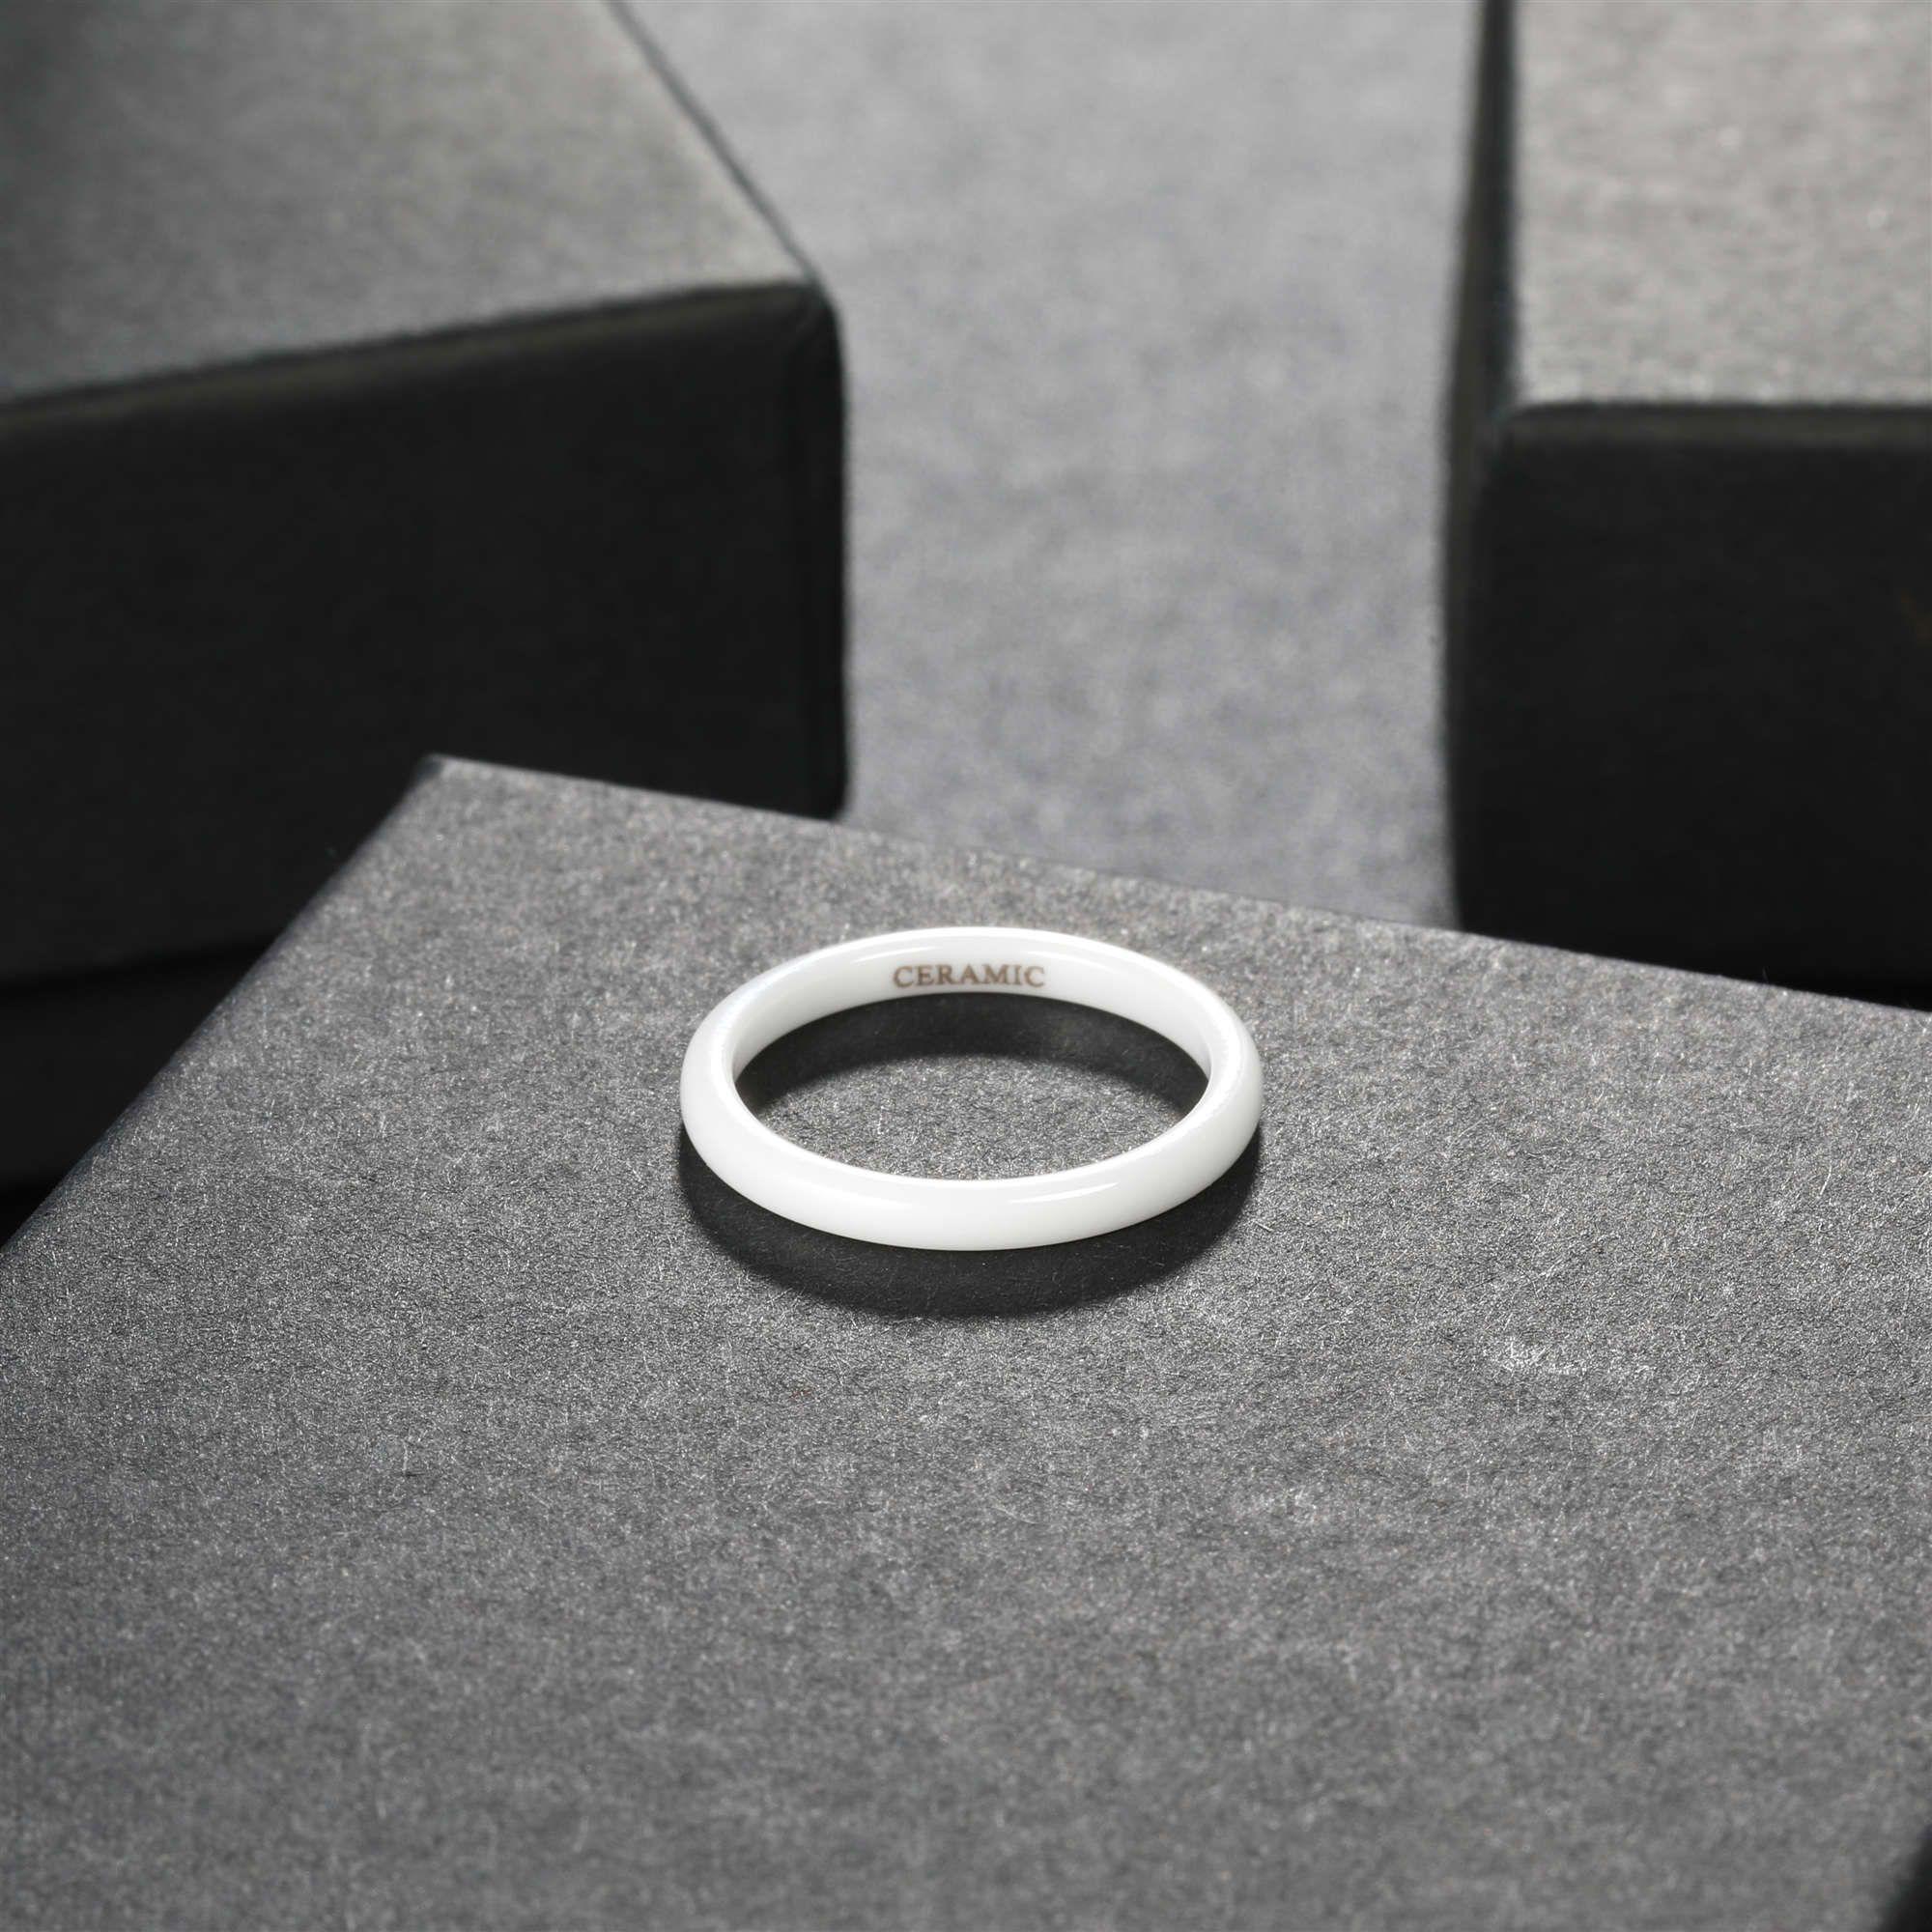 Ceramic Wedding Bands Find U Rings In 2020 Black Ceramic Ring Ceramic Rings Ceramic Wedding Bands